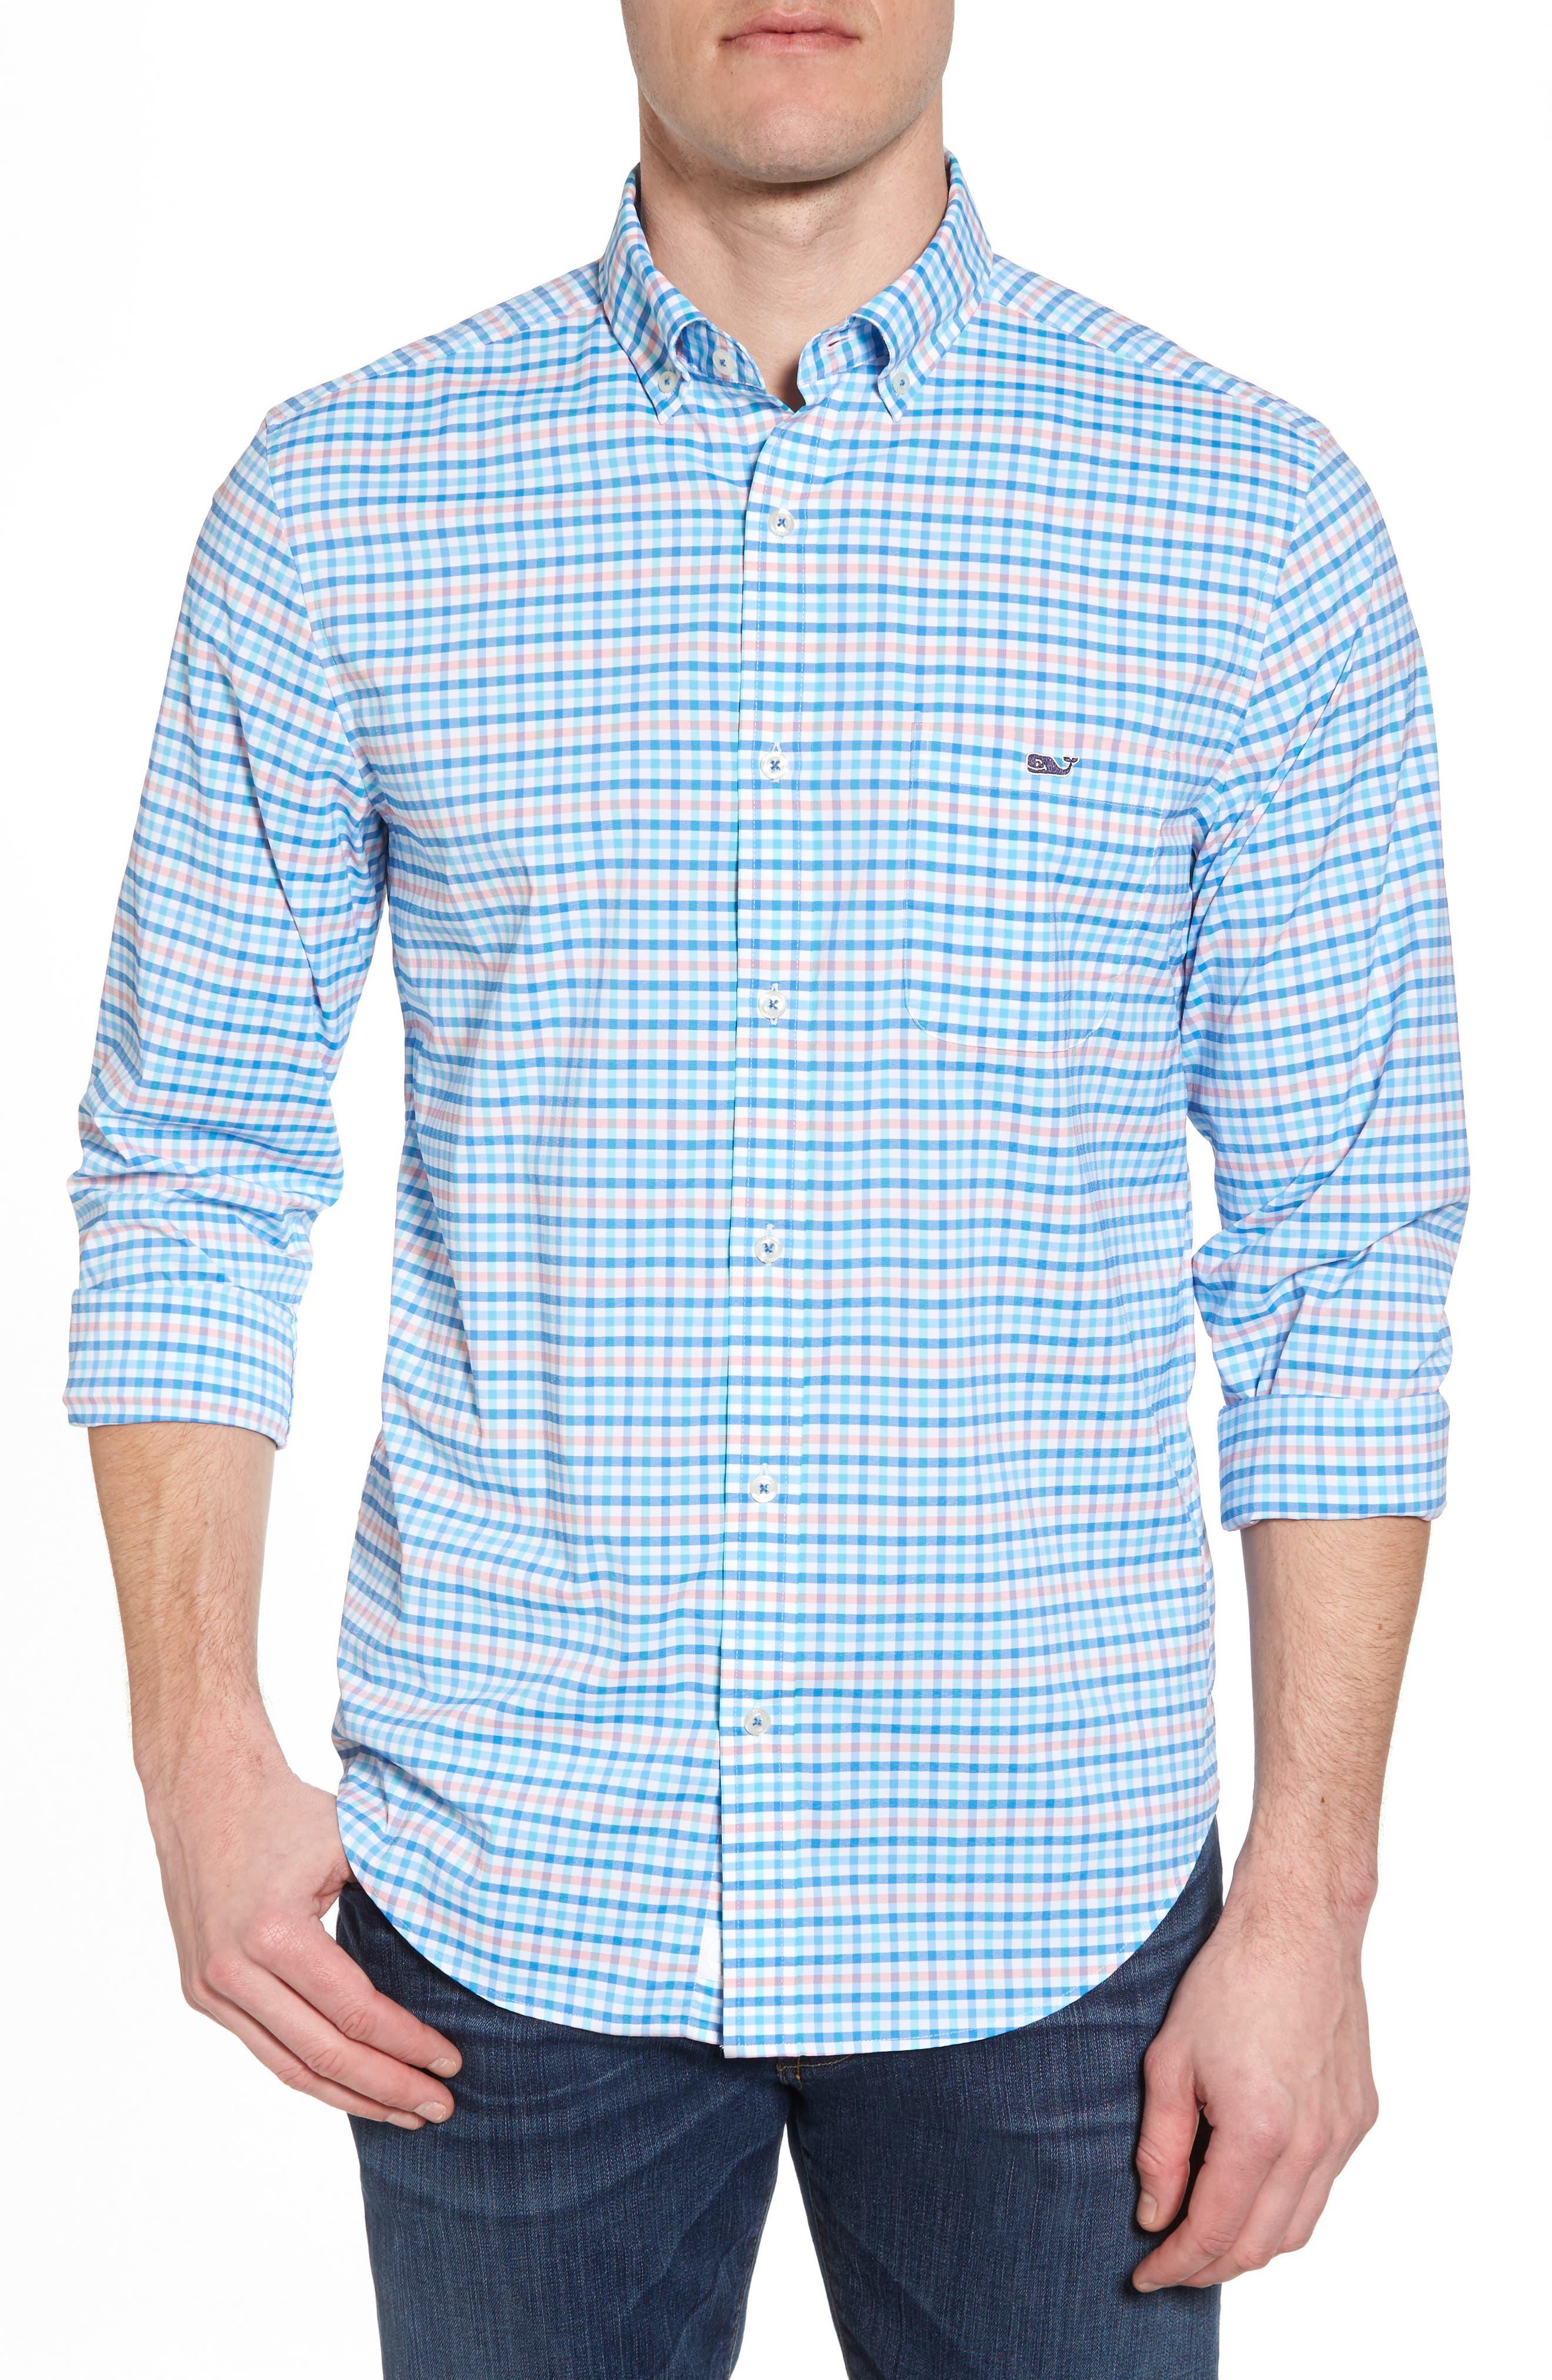 Coco Bay Classic Fit Check Performance Sport Shirt,                             Main thumbnail 1, color,                             Ocean Breeze